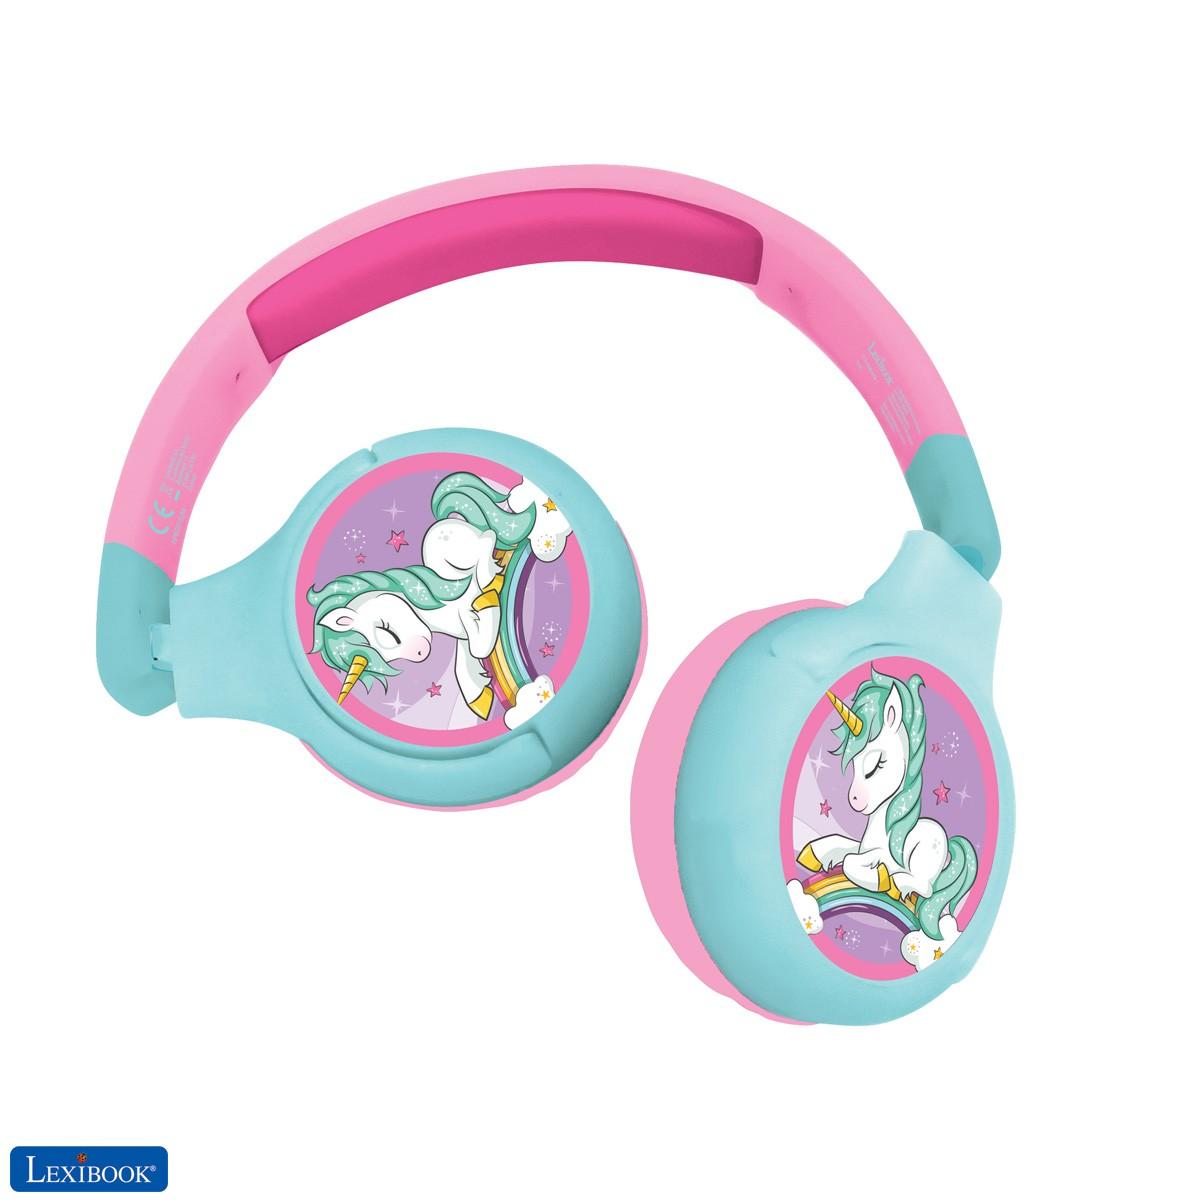 Unicorn 2-in-1 Bluetooth Headphones for Kids